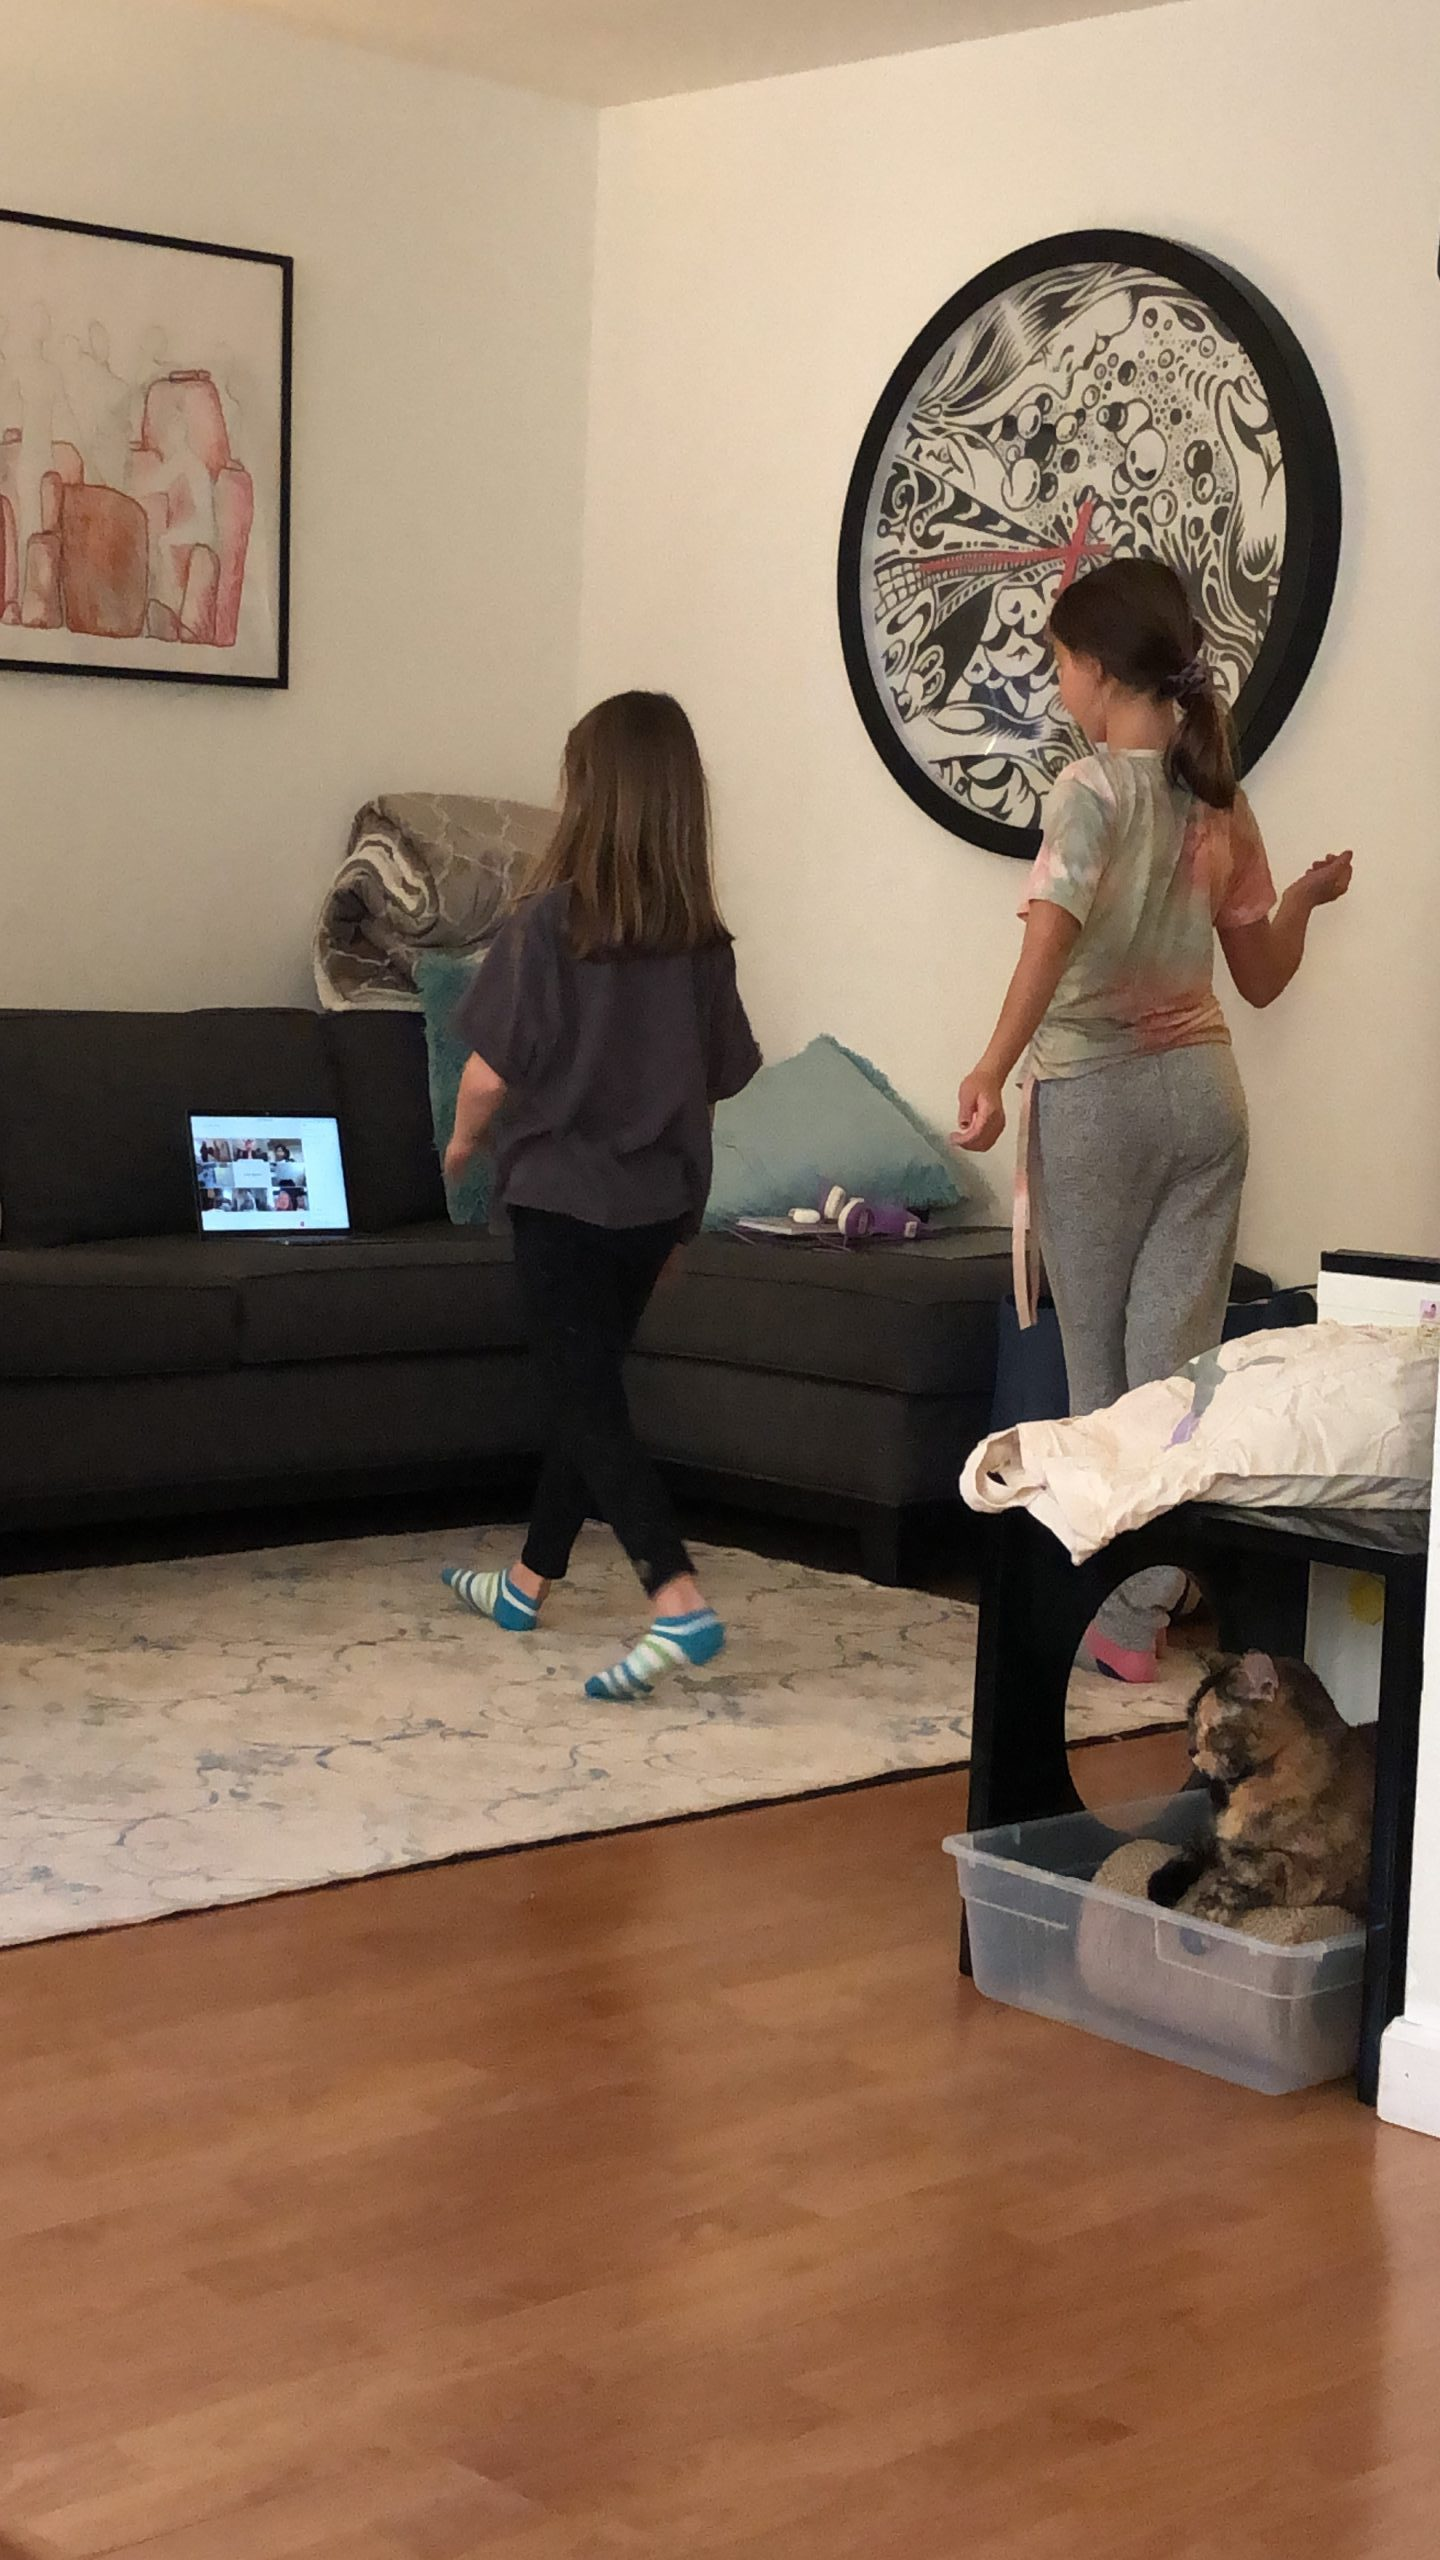 Kids activity break during remote online classes